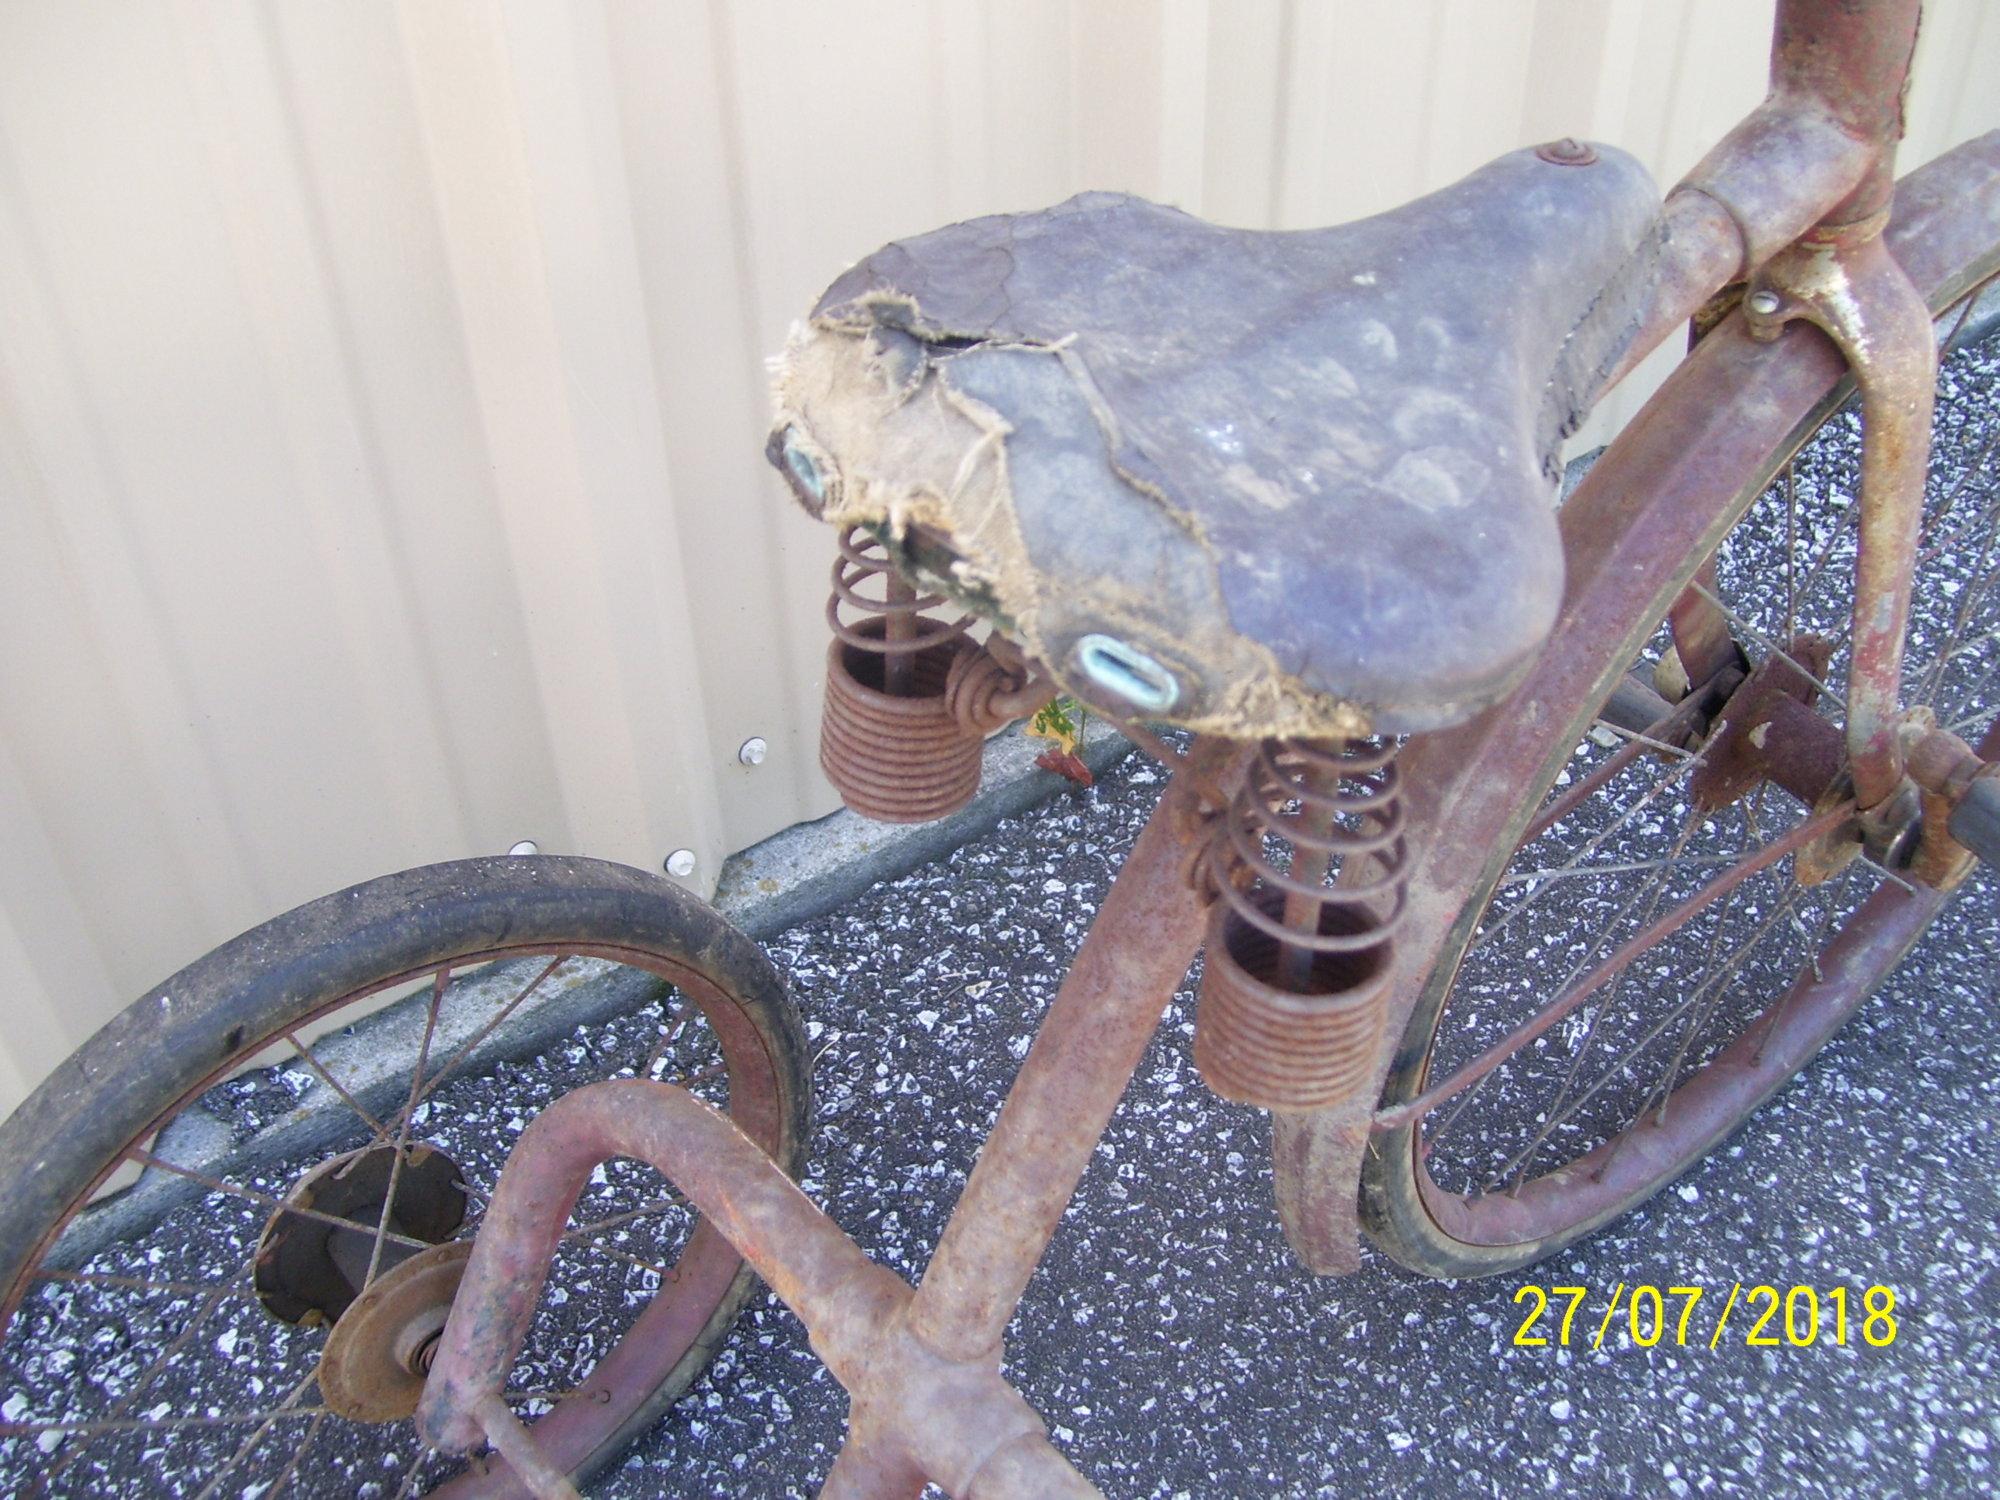 evans bikes 009.JPG